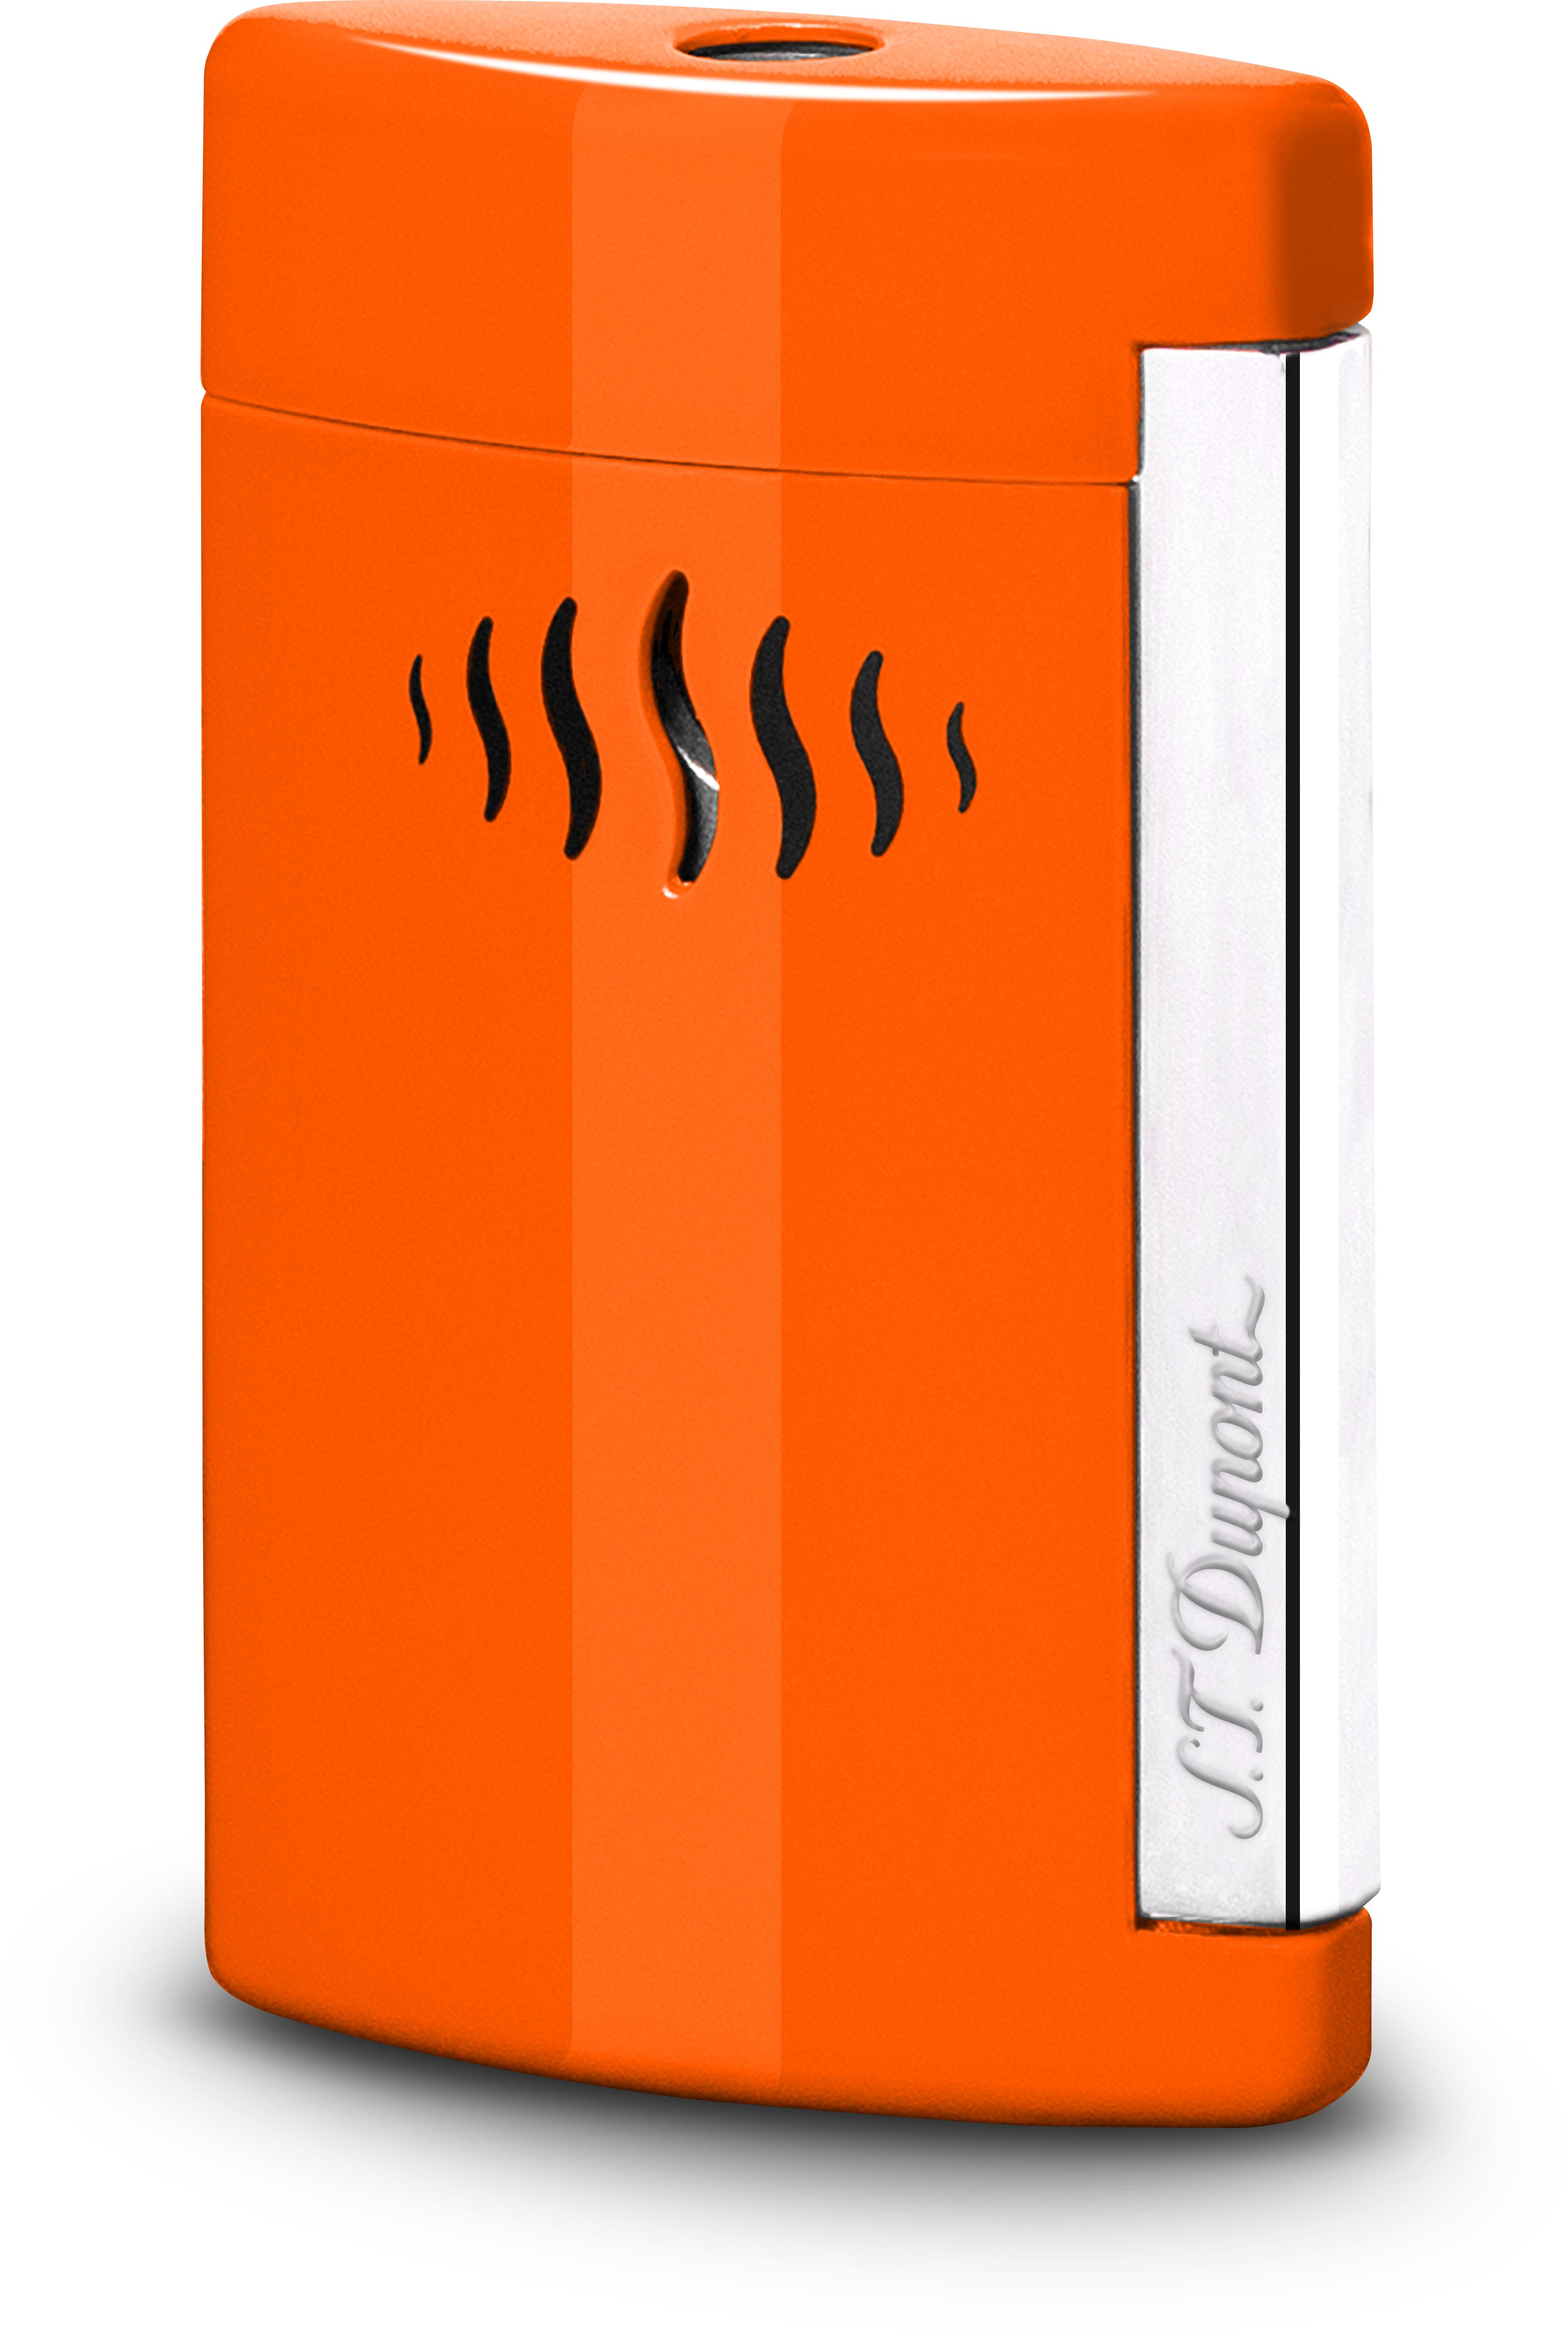 S.T. Dupont Minijet Coral Orange